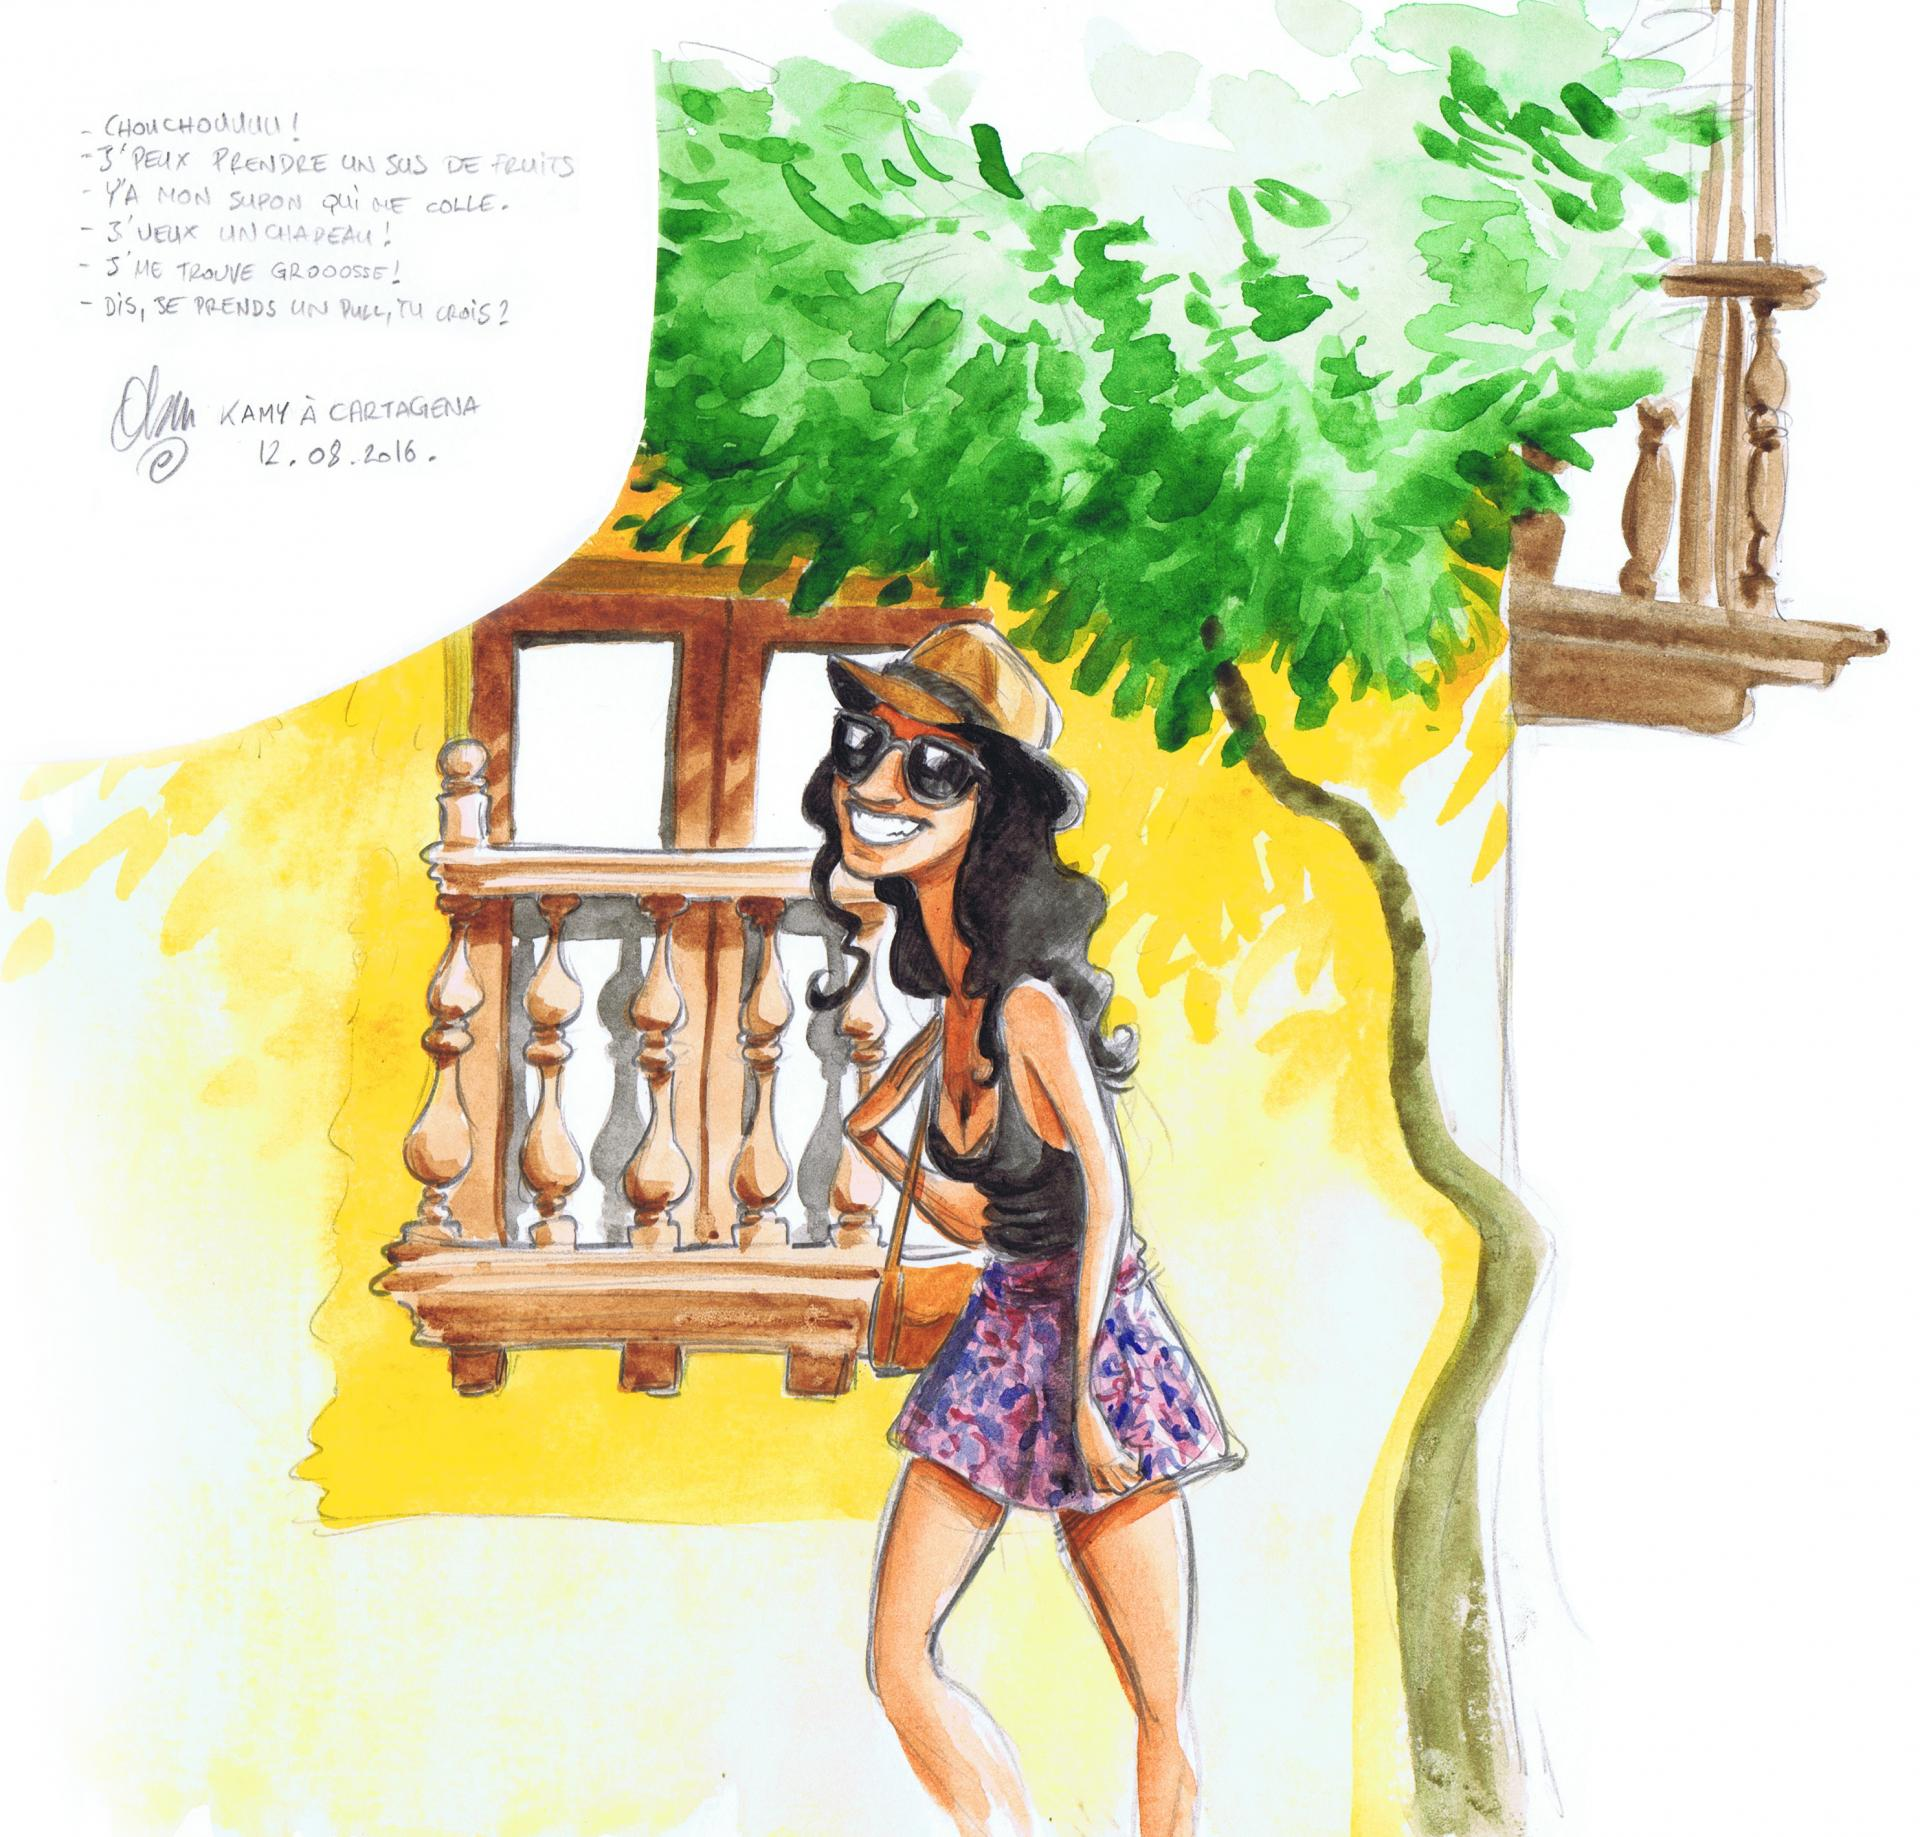 Cartagena Kamilia